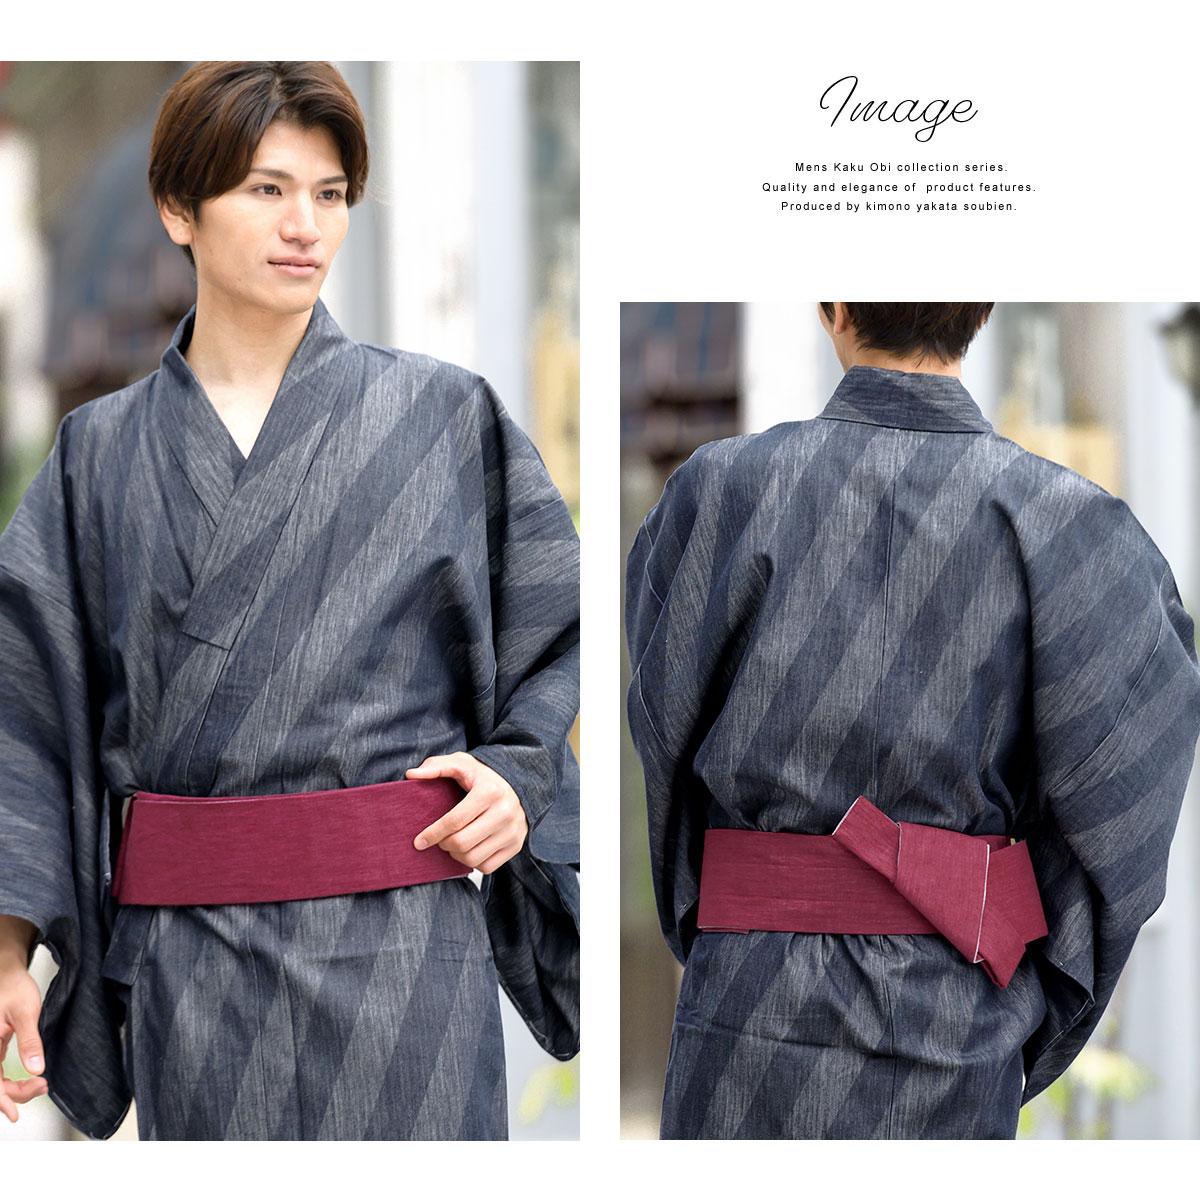 Japanese Traditional KAKU OBI Kimono Belt One Touch Easy Red Made in JAPAN